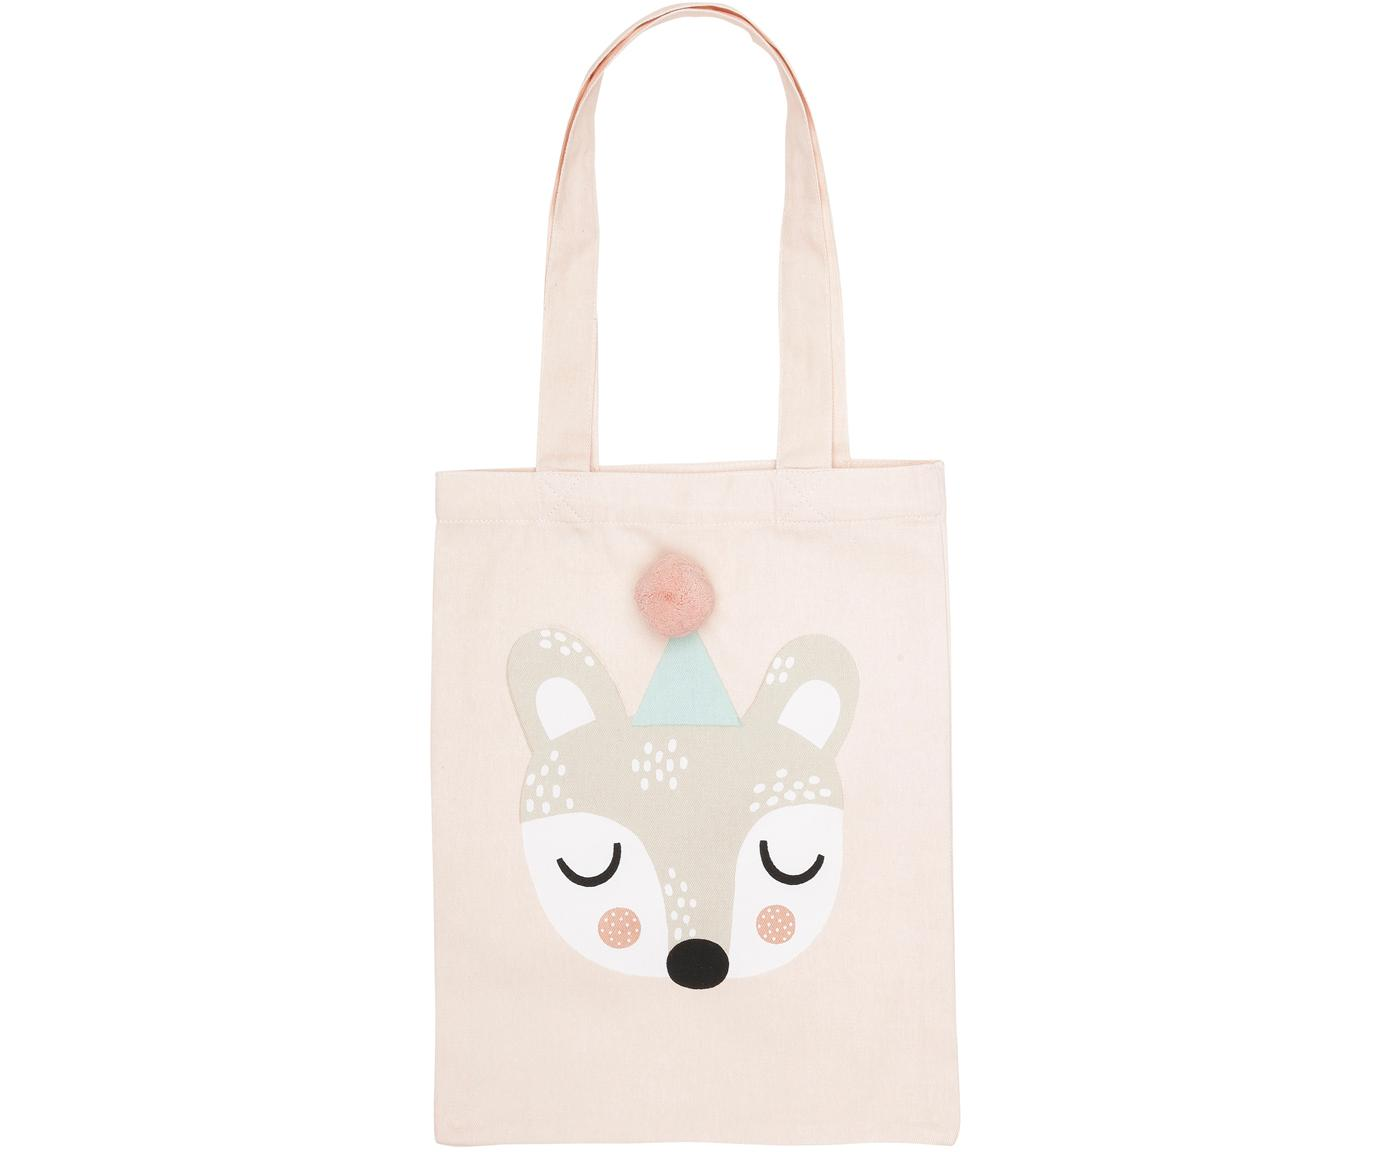 Bolso de algodón ecológico Bear Bibi, Algodón orgánico, Rosa, beige, blanco, negro, verde menta, An 25 x Al 32 cm